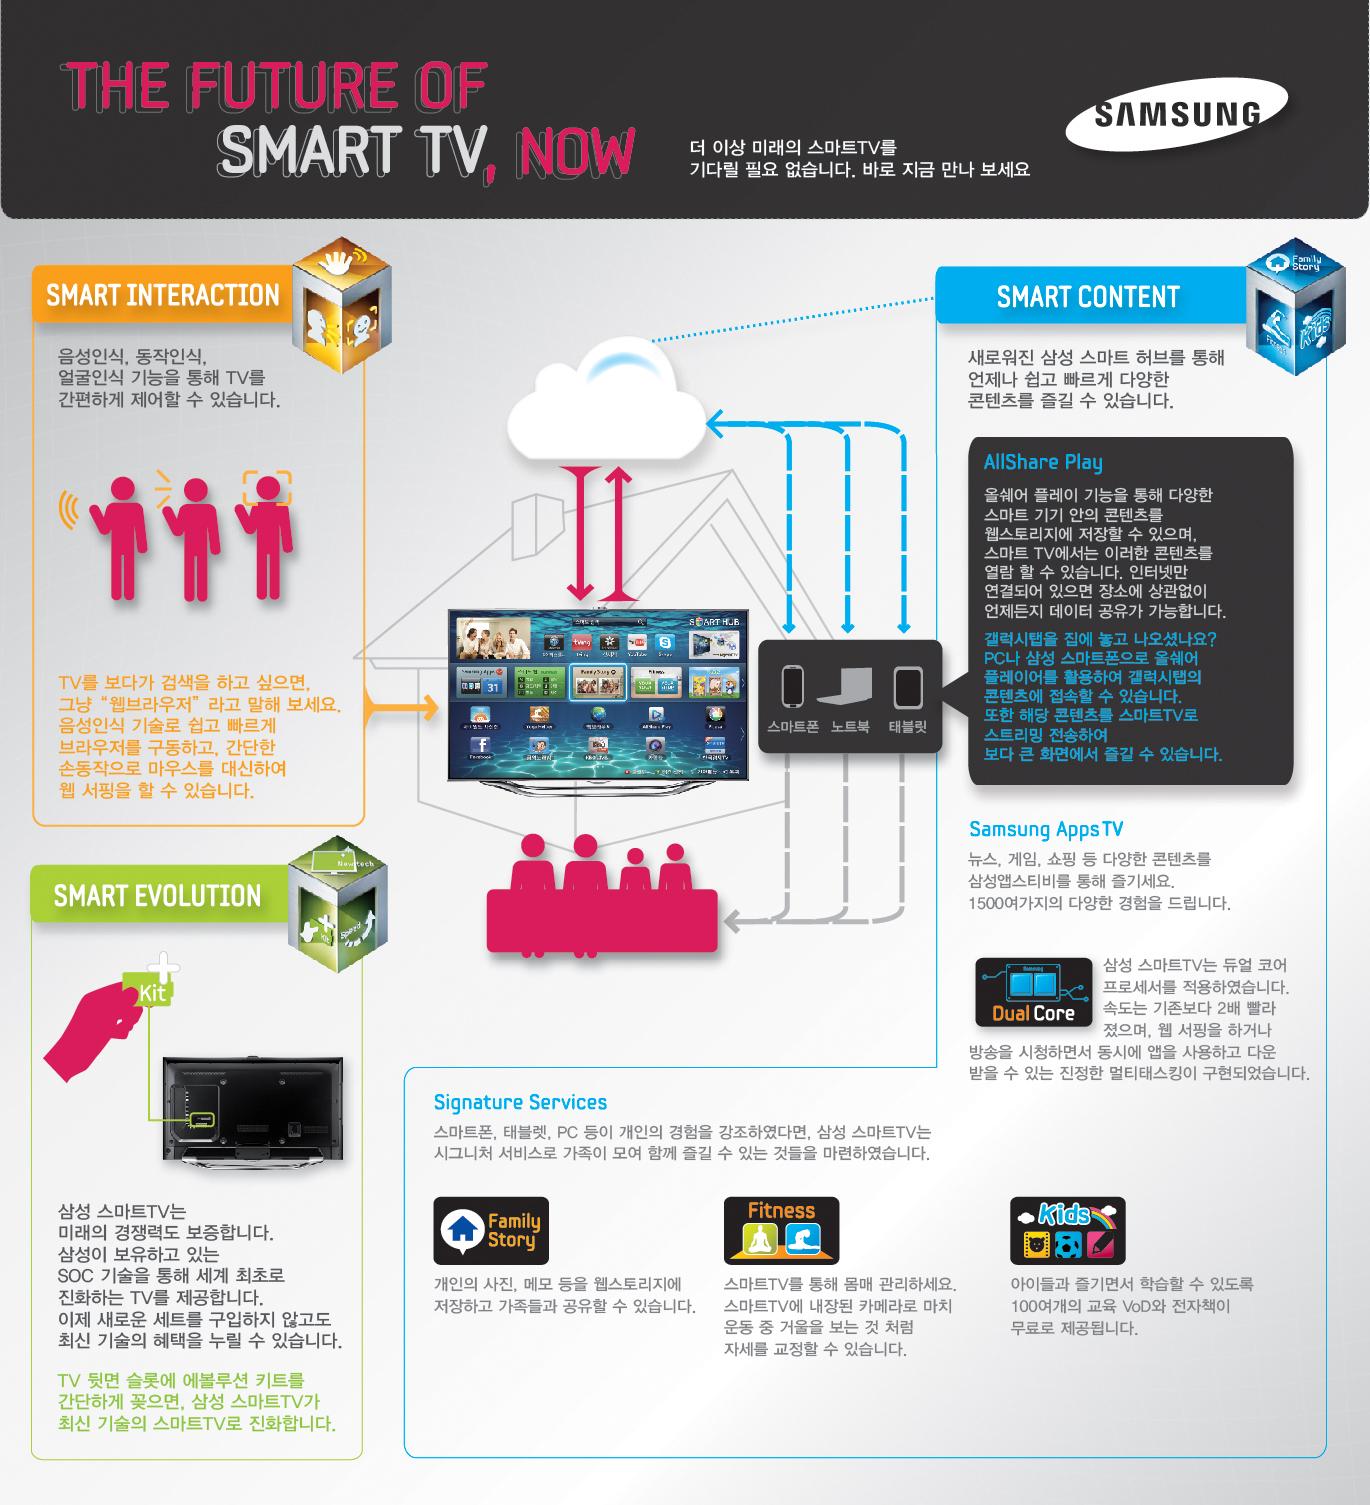 the future of smart TV, NOw 더이상 미래의 스마트 TV를 기다릴 필요 없습니다. 바로 지금 만나보세요